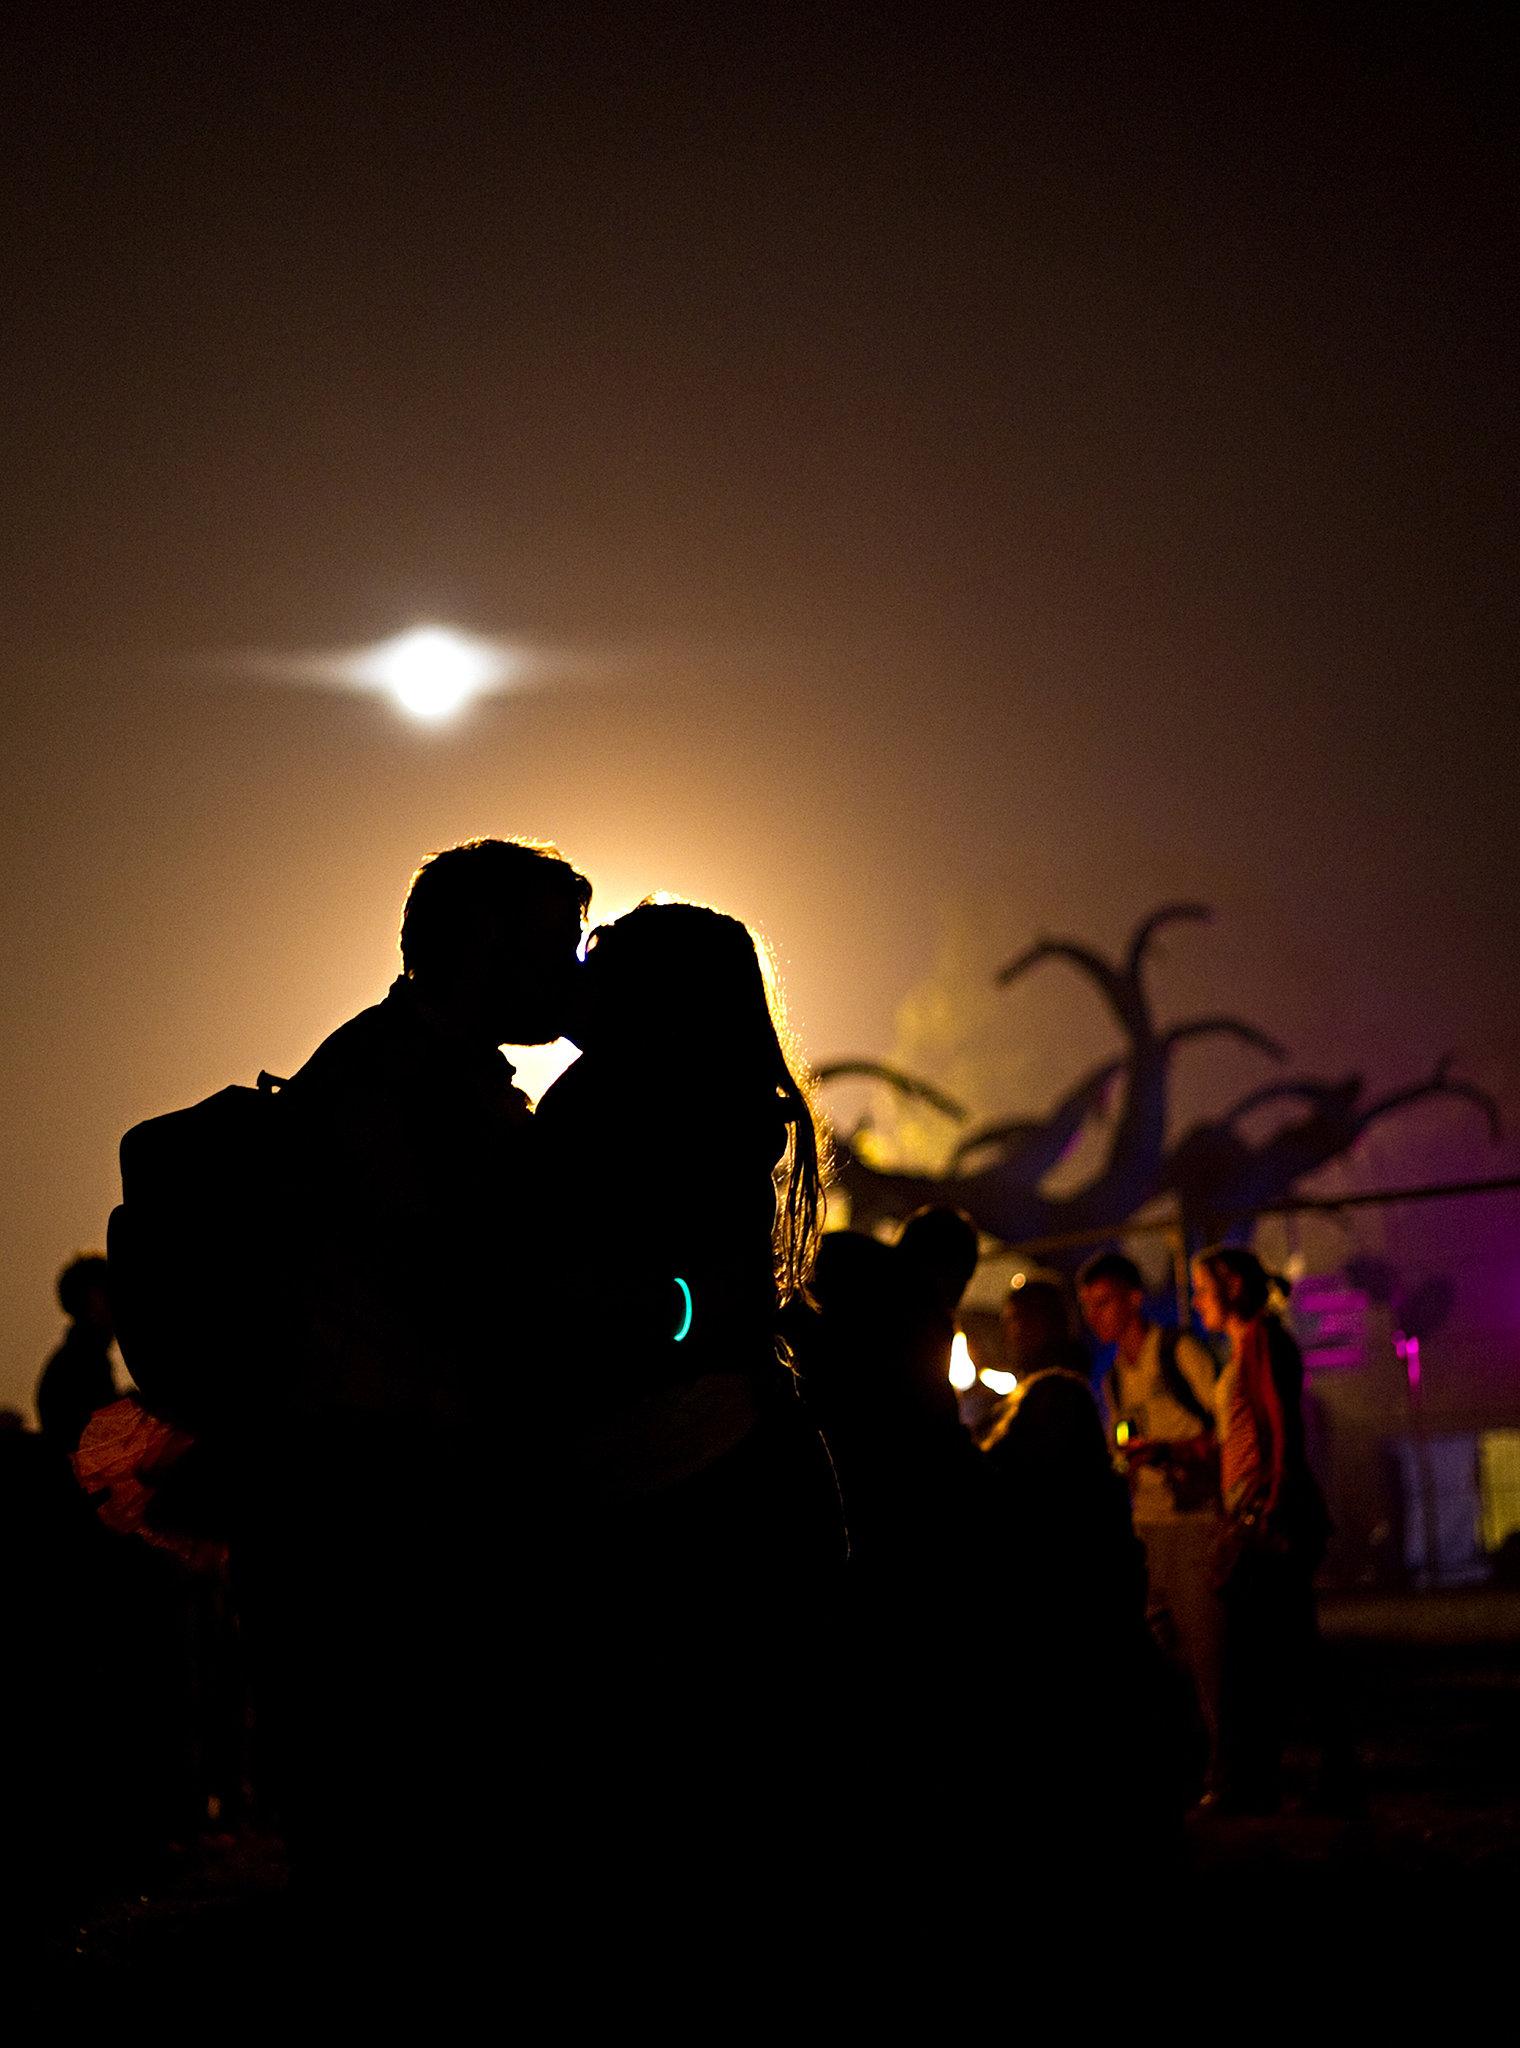 A pair kissed at Glastonbury festival.